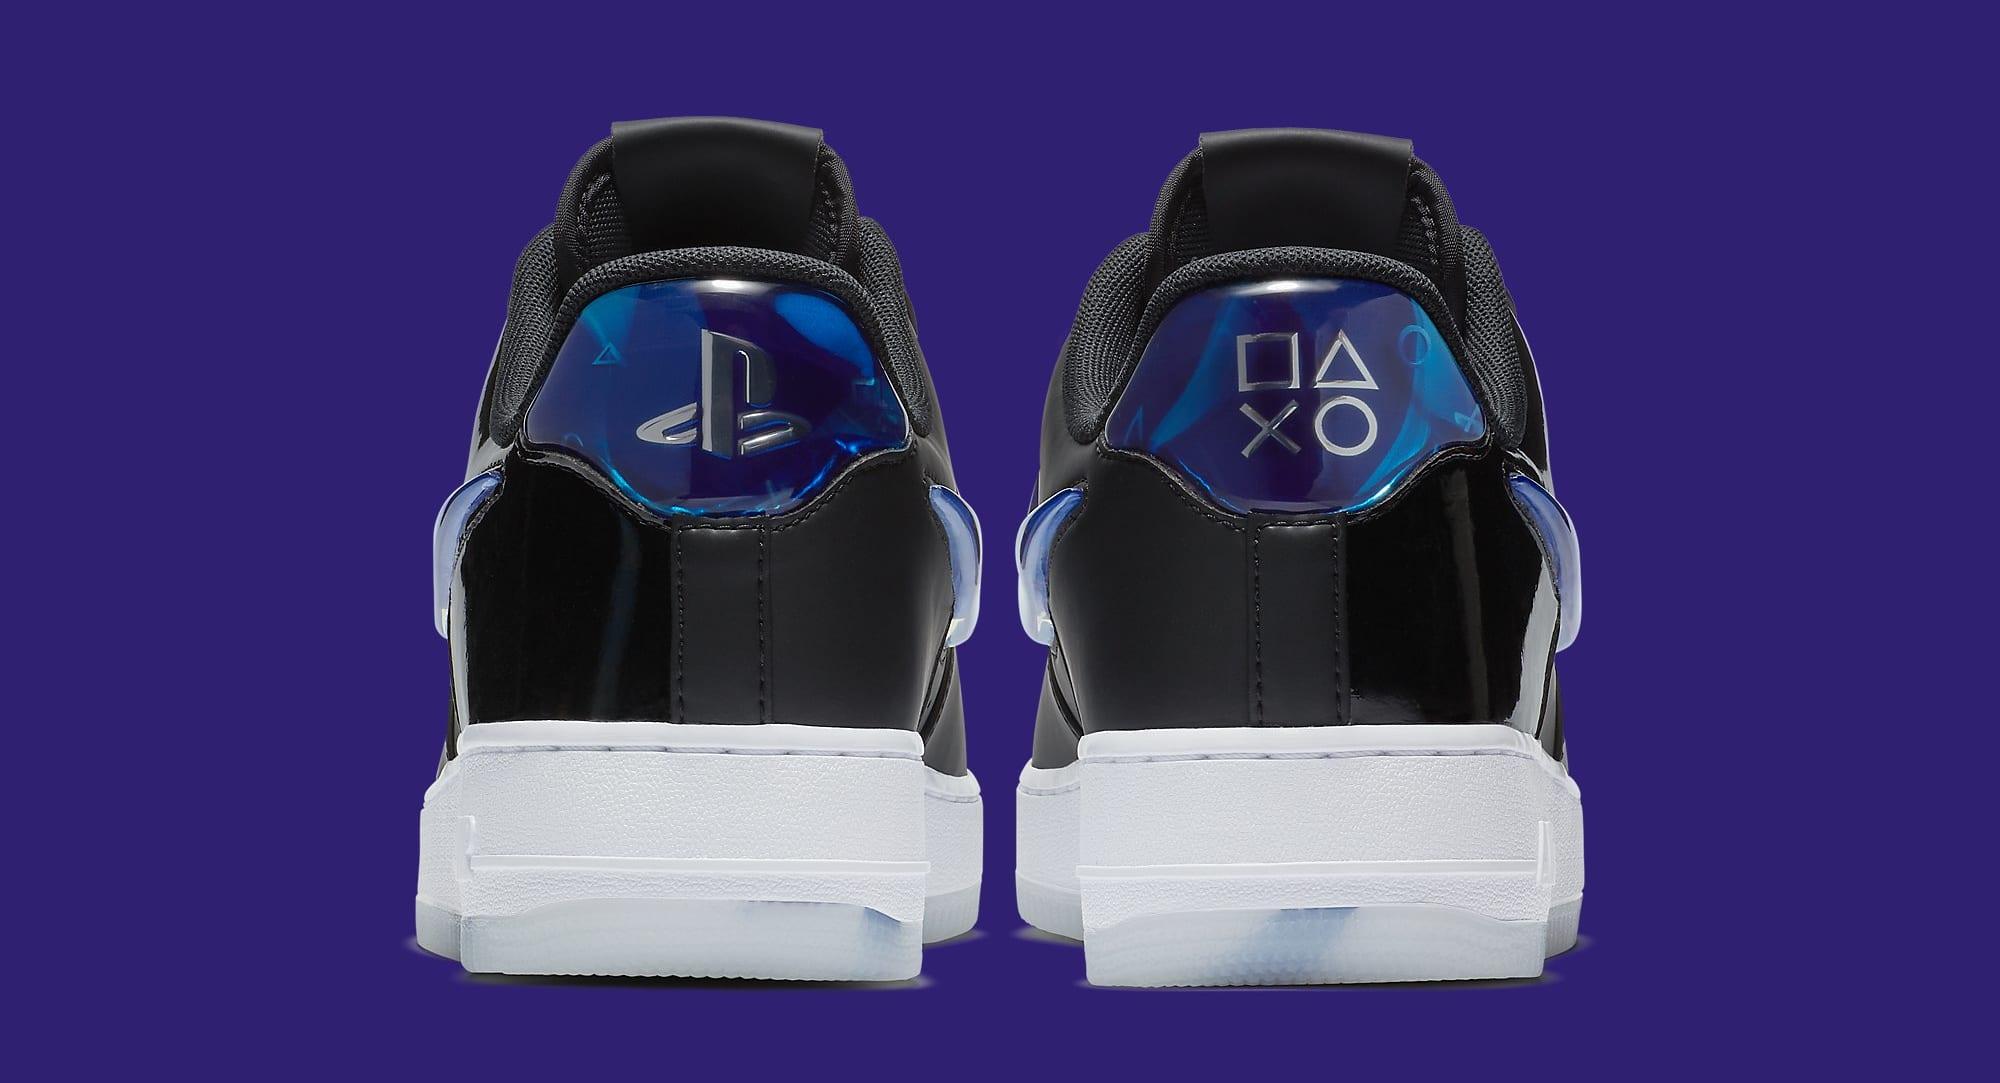 Playstation x Nike Air Force 1 Low BQ3634-001 (Heel)